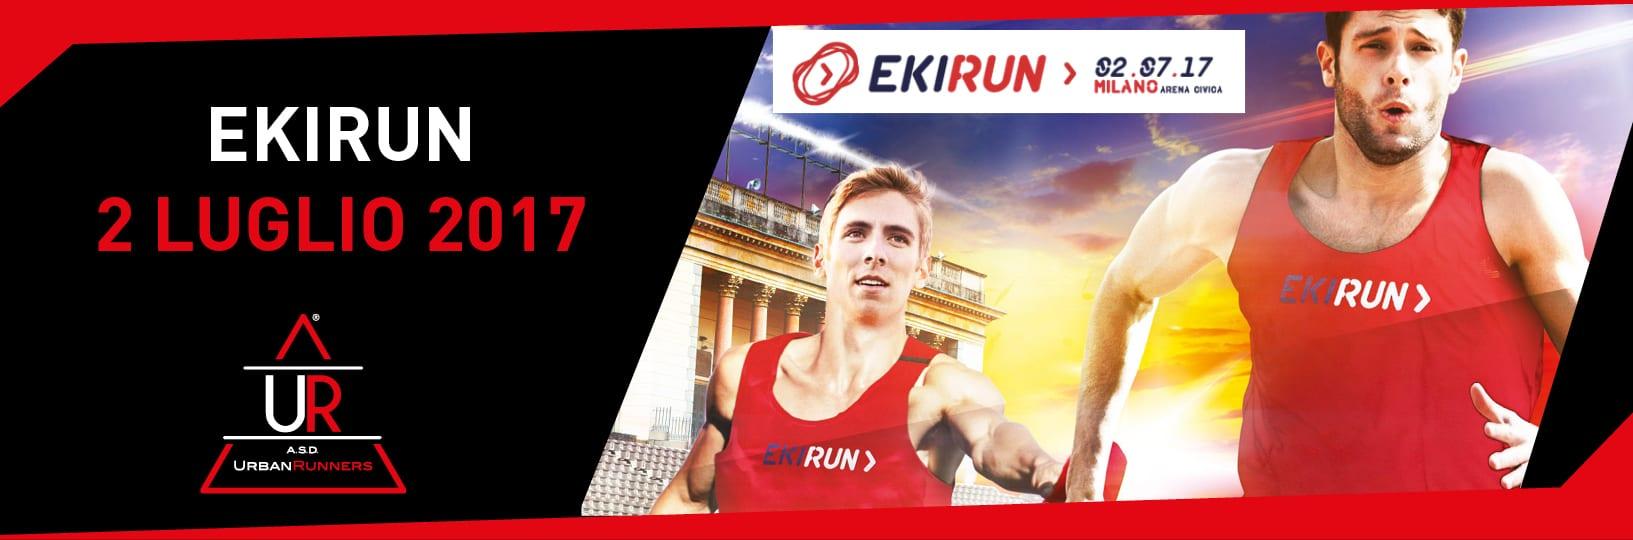 Squadre Urban alla Ekirun 2017